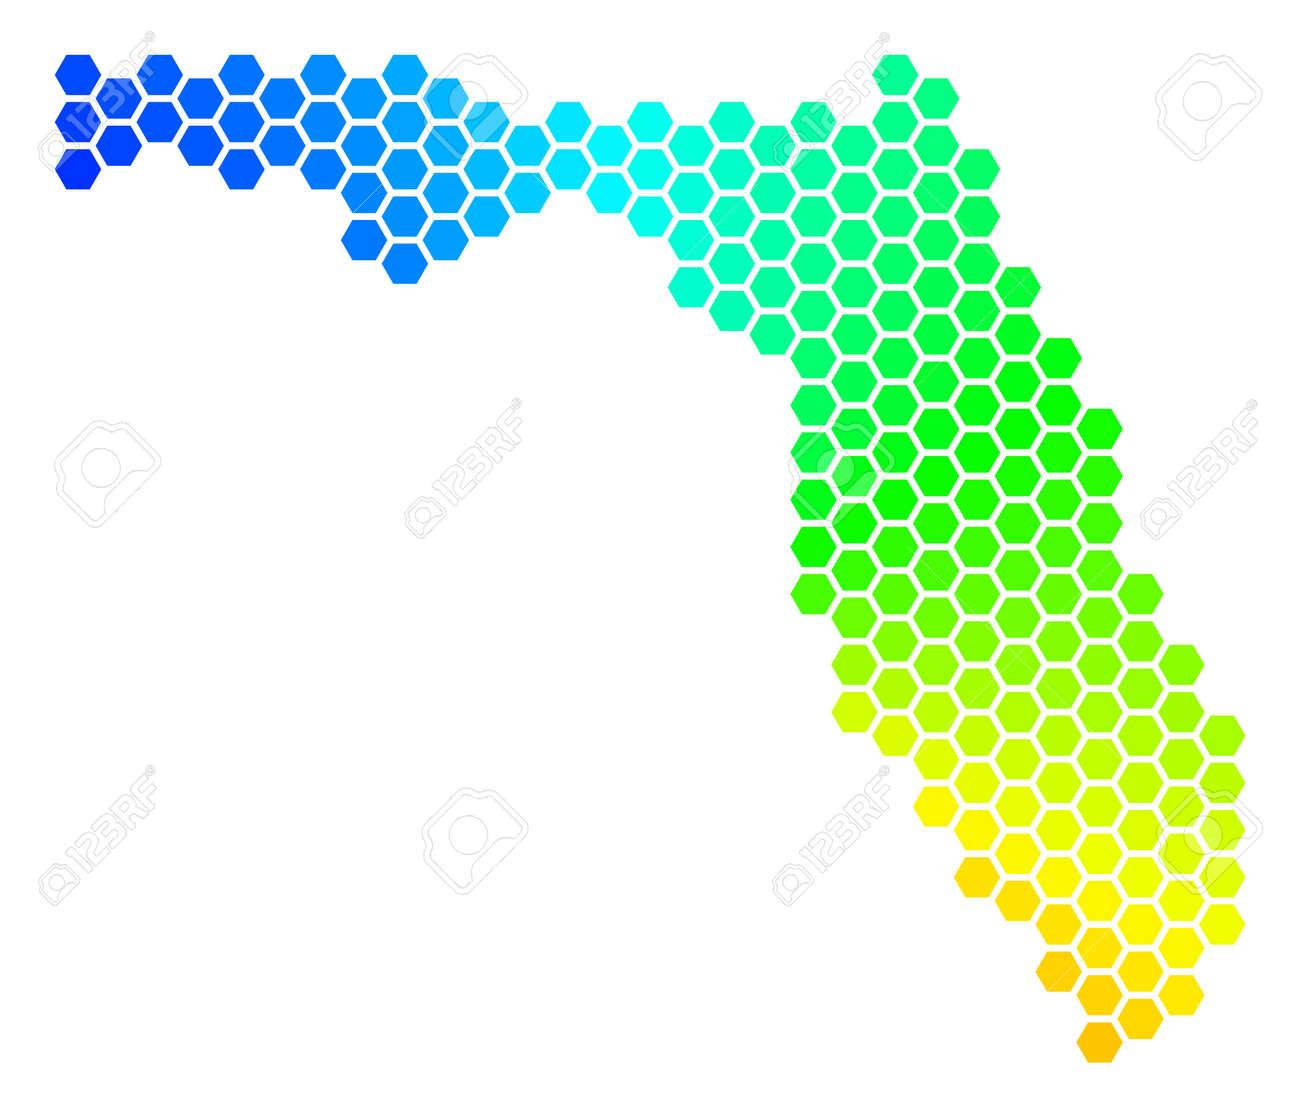 Spectrum hexagon Map  Vector geographic map in rainbow colors